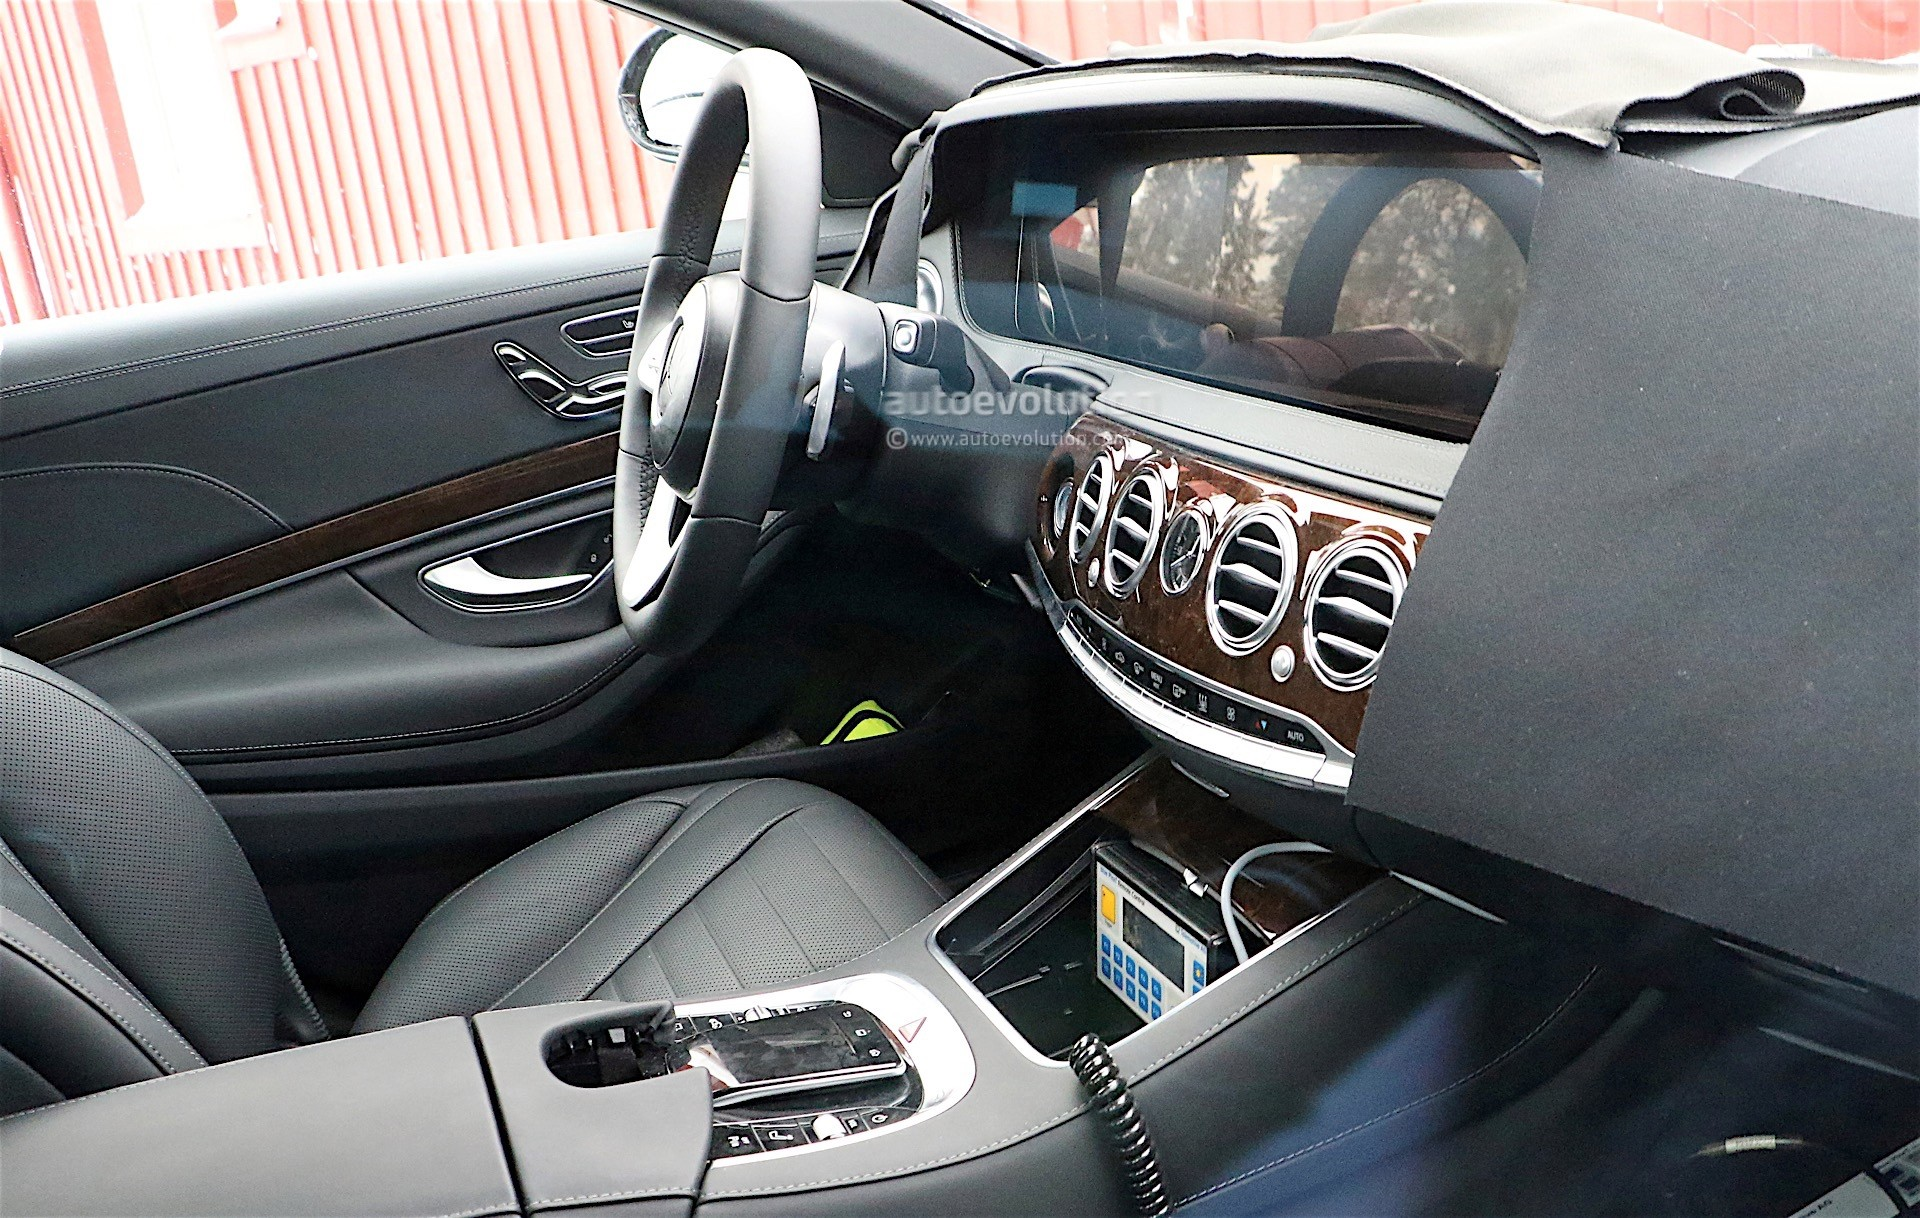 2018 Mercedes Benz S Class Facelift Spyshots Reveal New